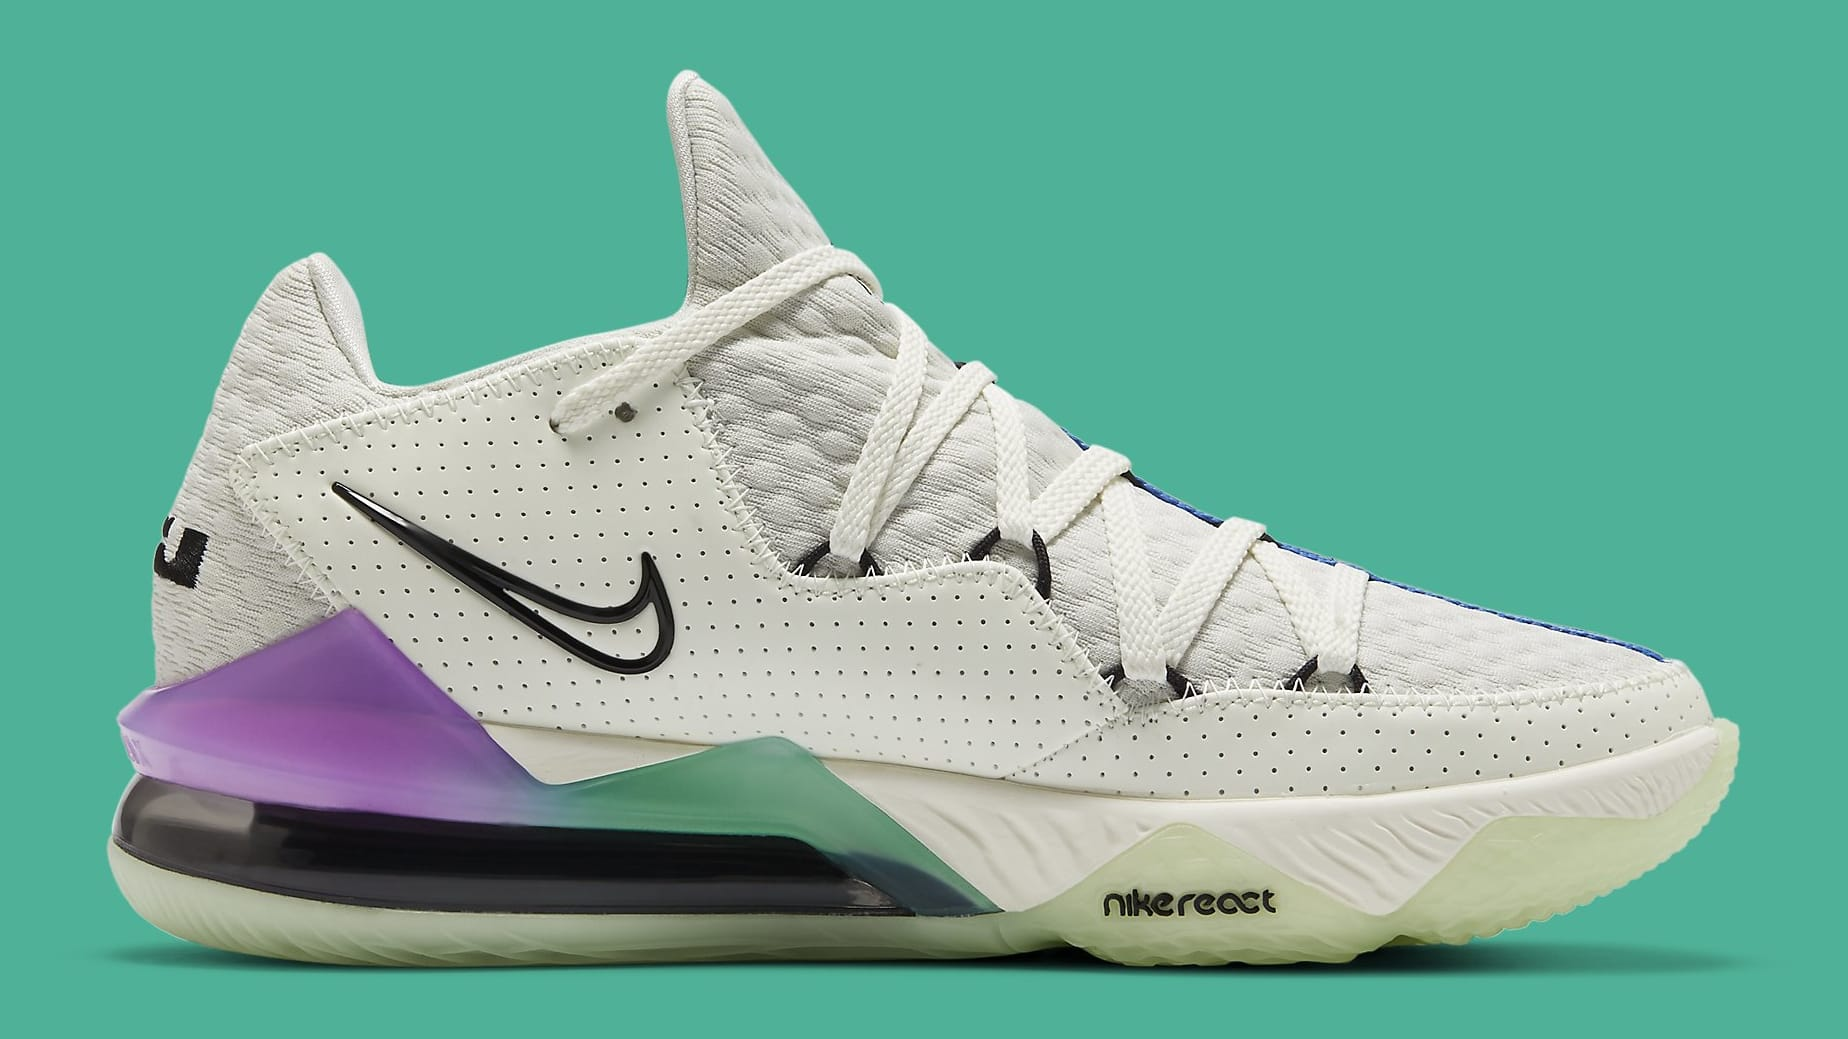 Nike LeBron 17 Low Glow in the Dark Release Date CD5007-005 Medial